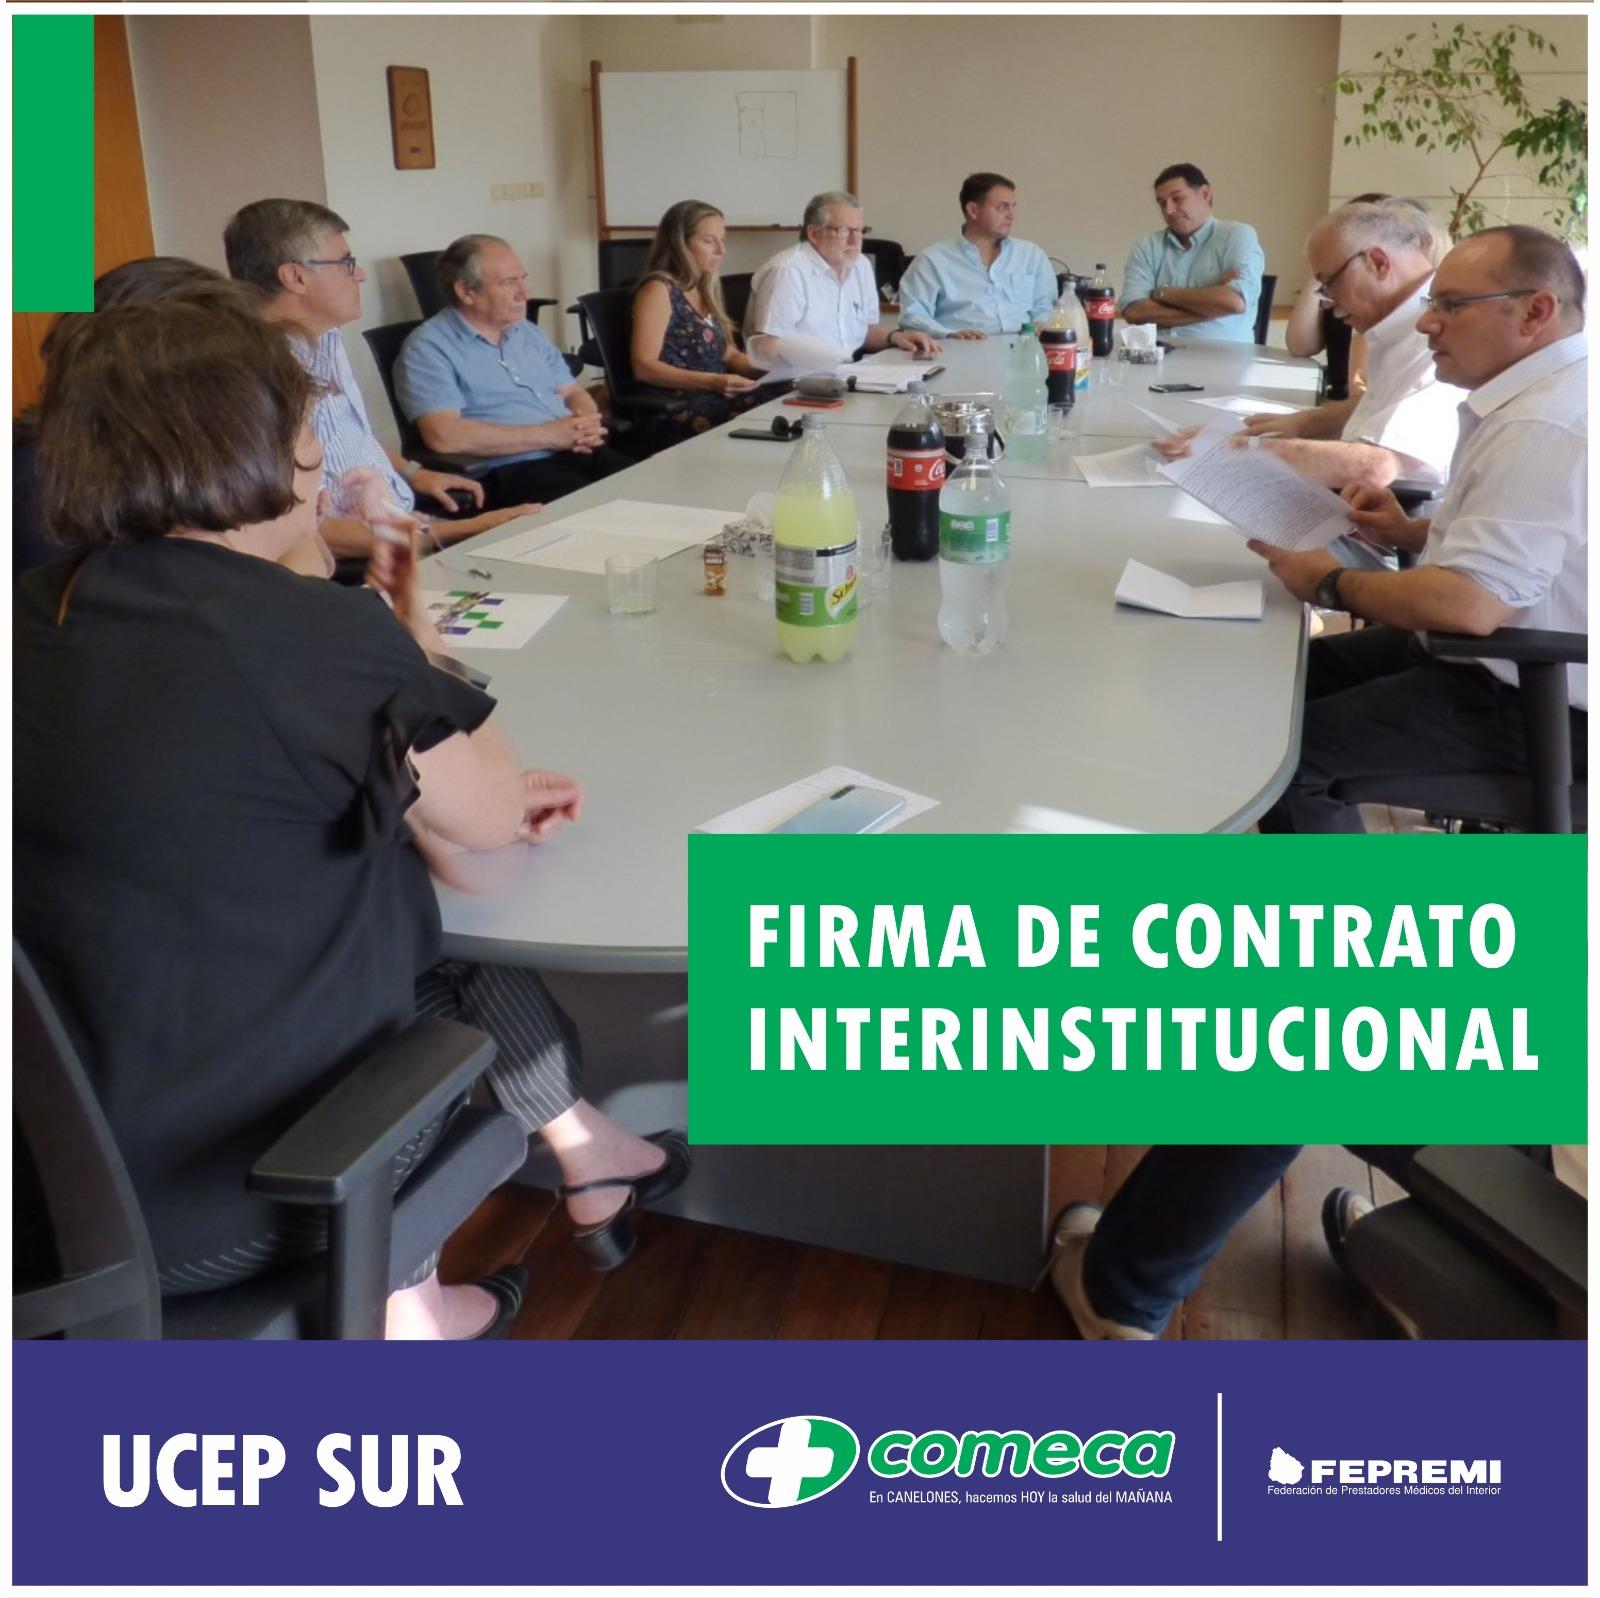 Firma de contrato interinstitucional - UCEP SUR